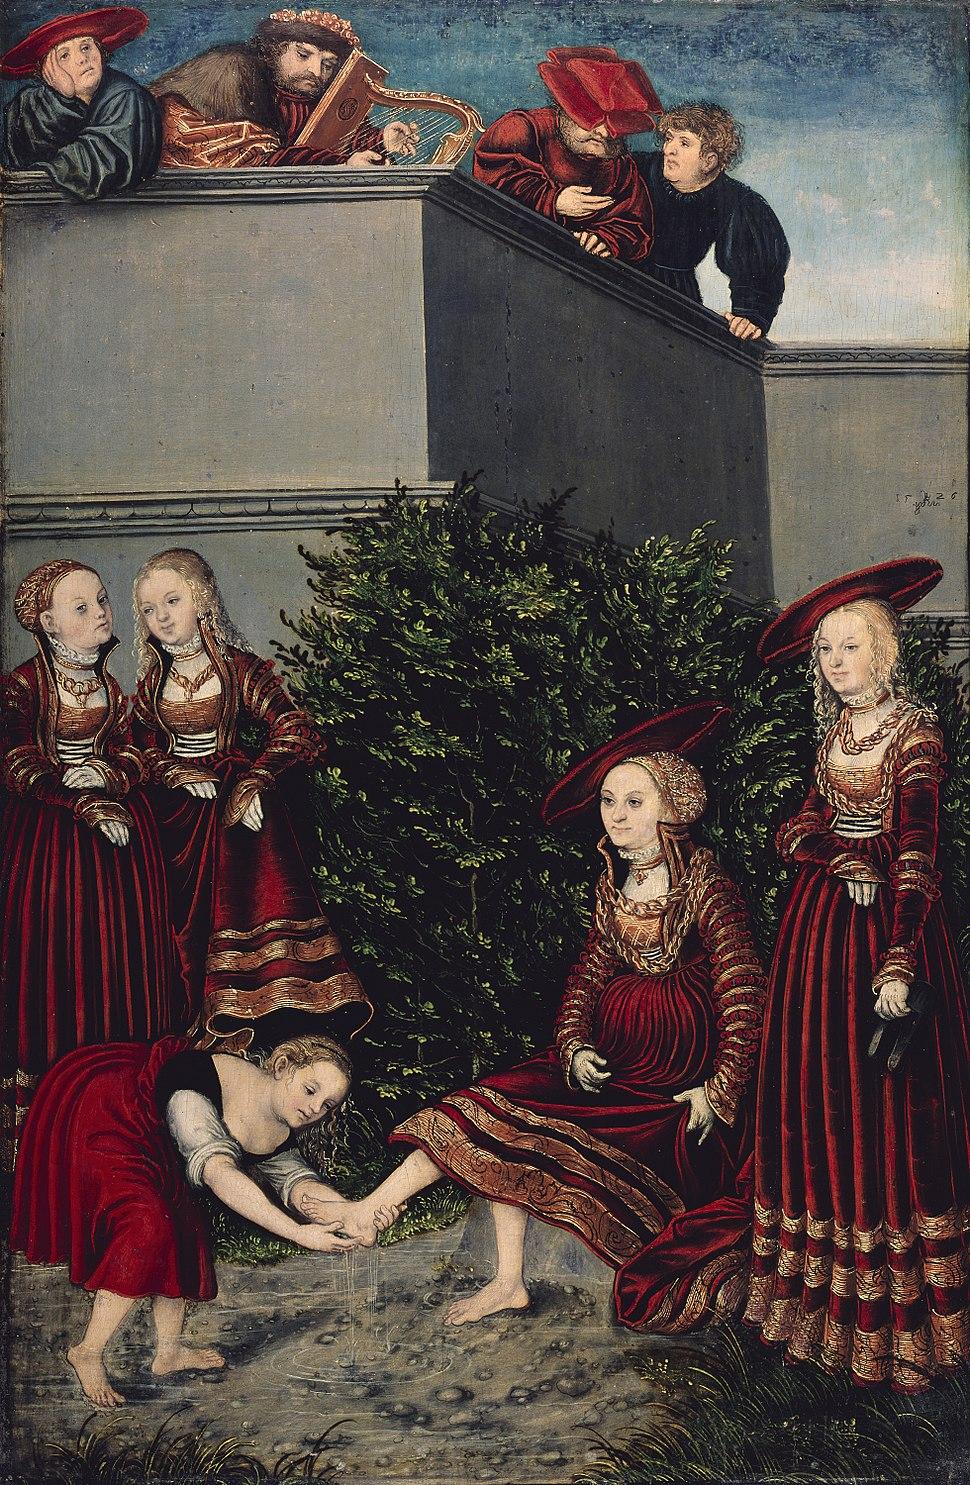 Lucas Cranach d.Ä. - David und Bathseba (Gemäldegalerie, Berlin)